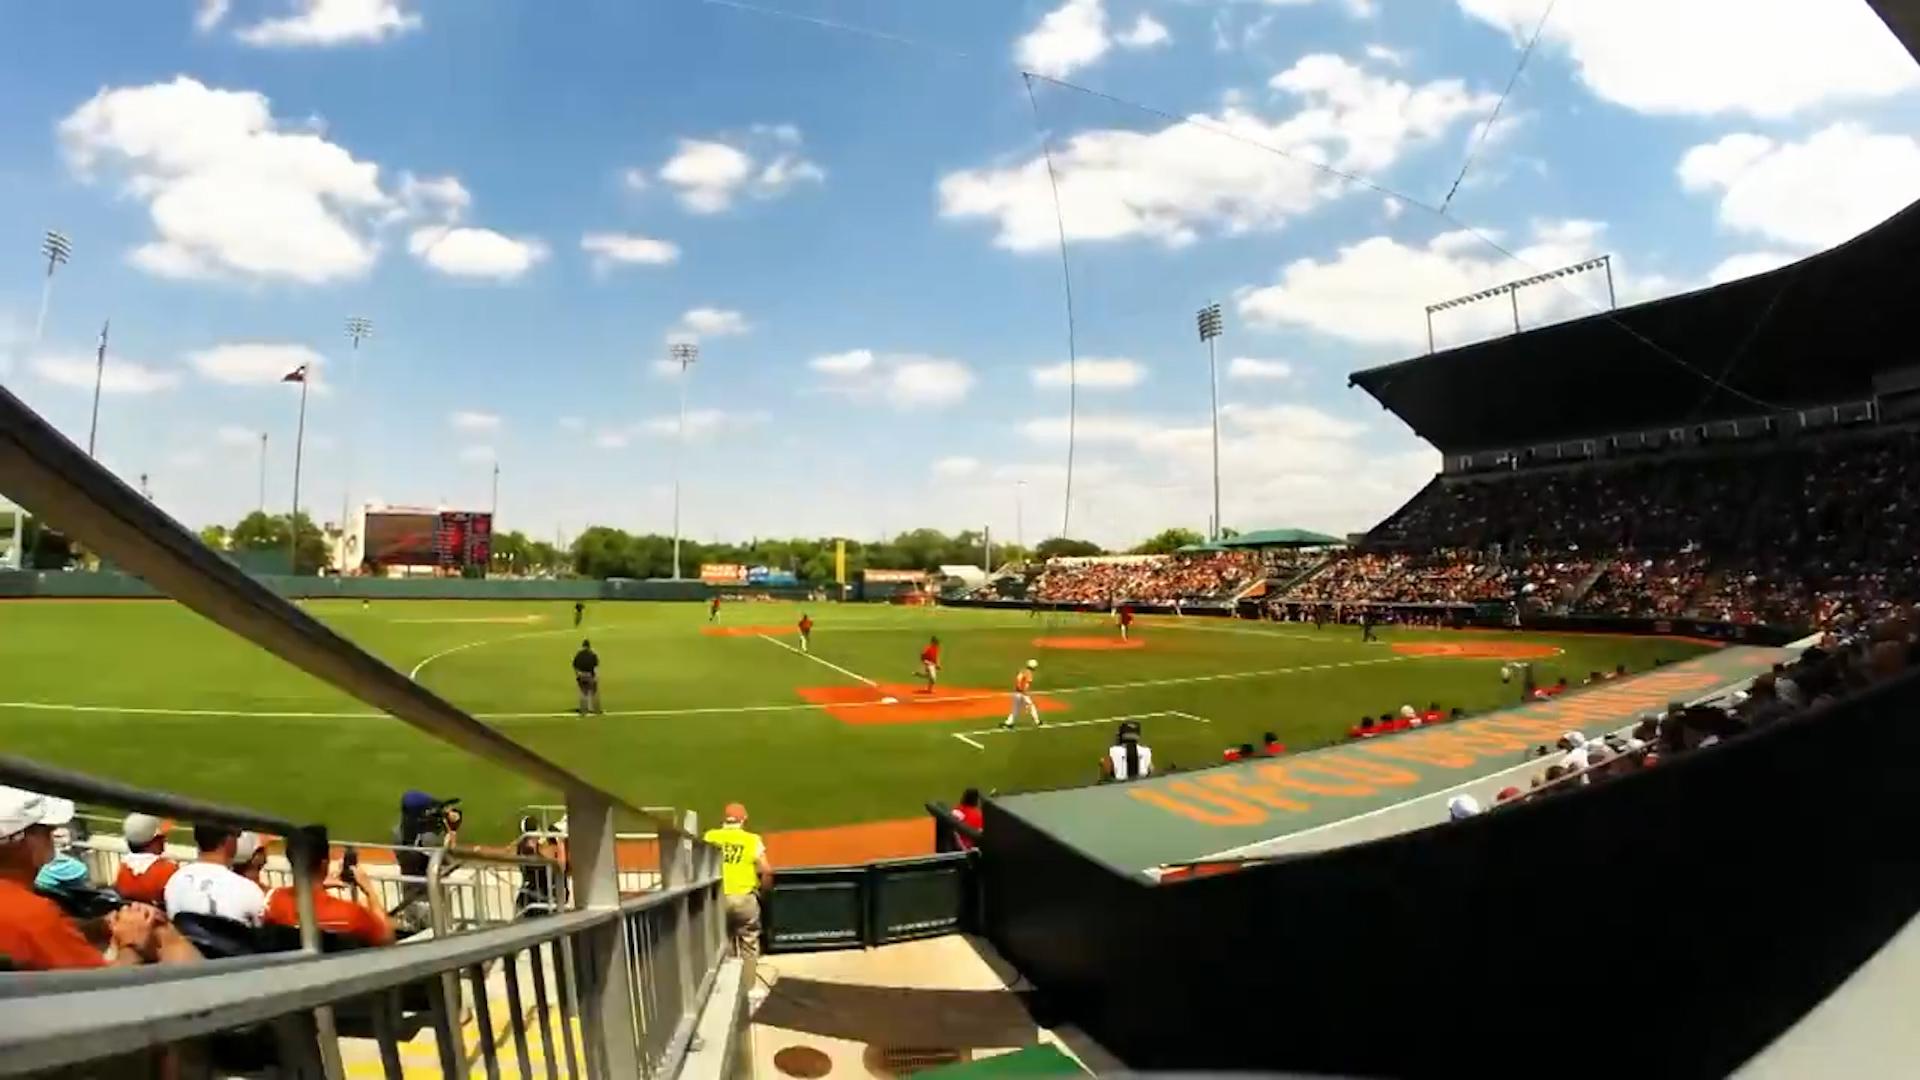 texas baseball disch falk field UT_1551398588441.jpg.jpg